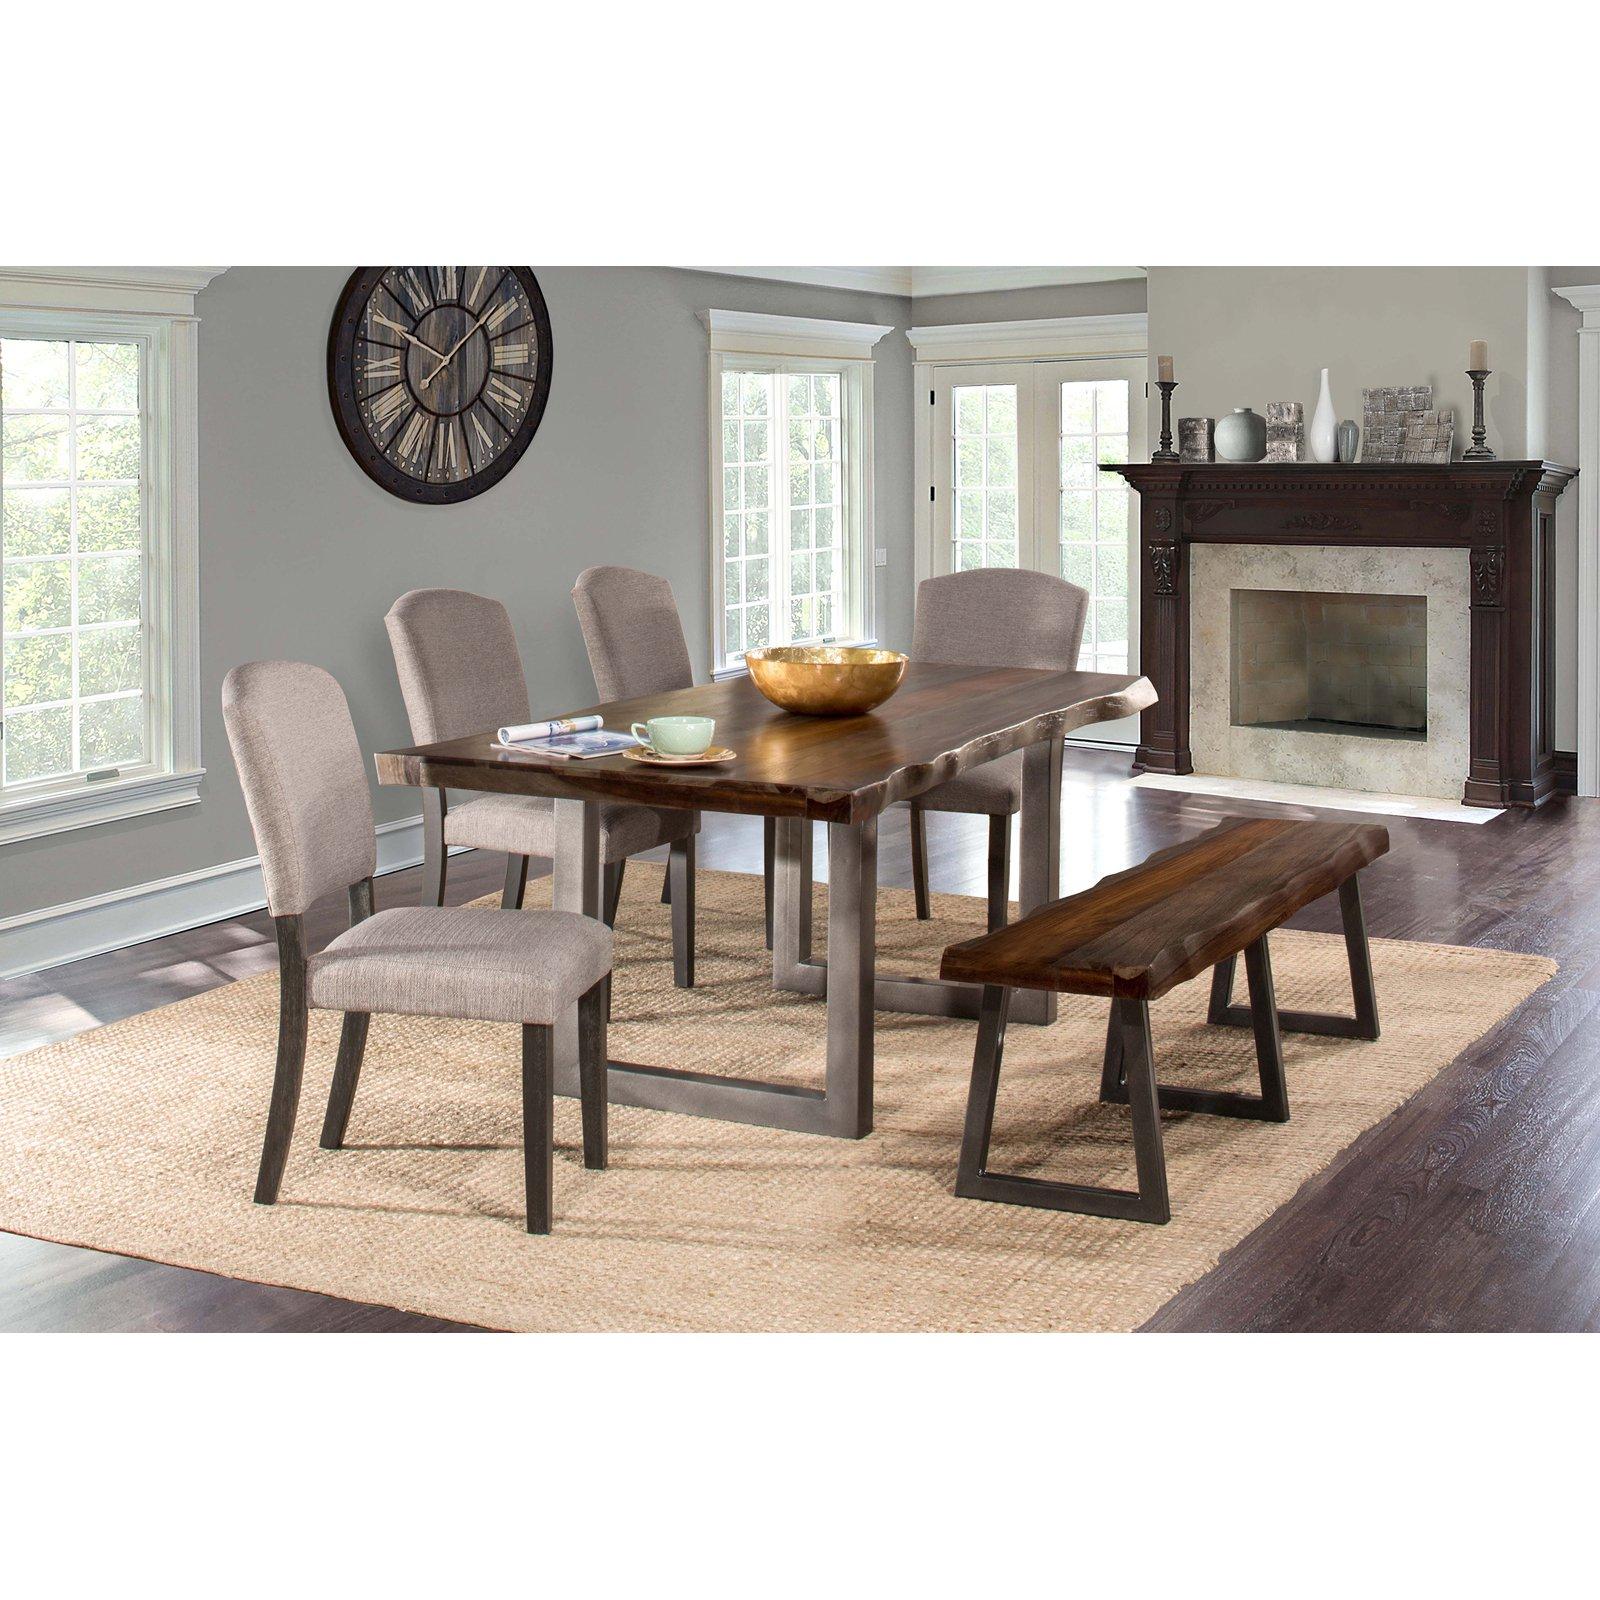 Hillsdale Furniture Emerson 6-Piece Rectangle Dining Set, Mulitple Colors